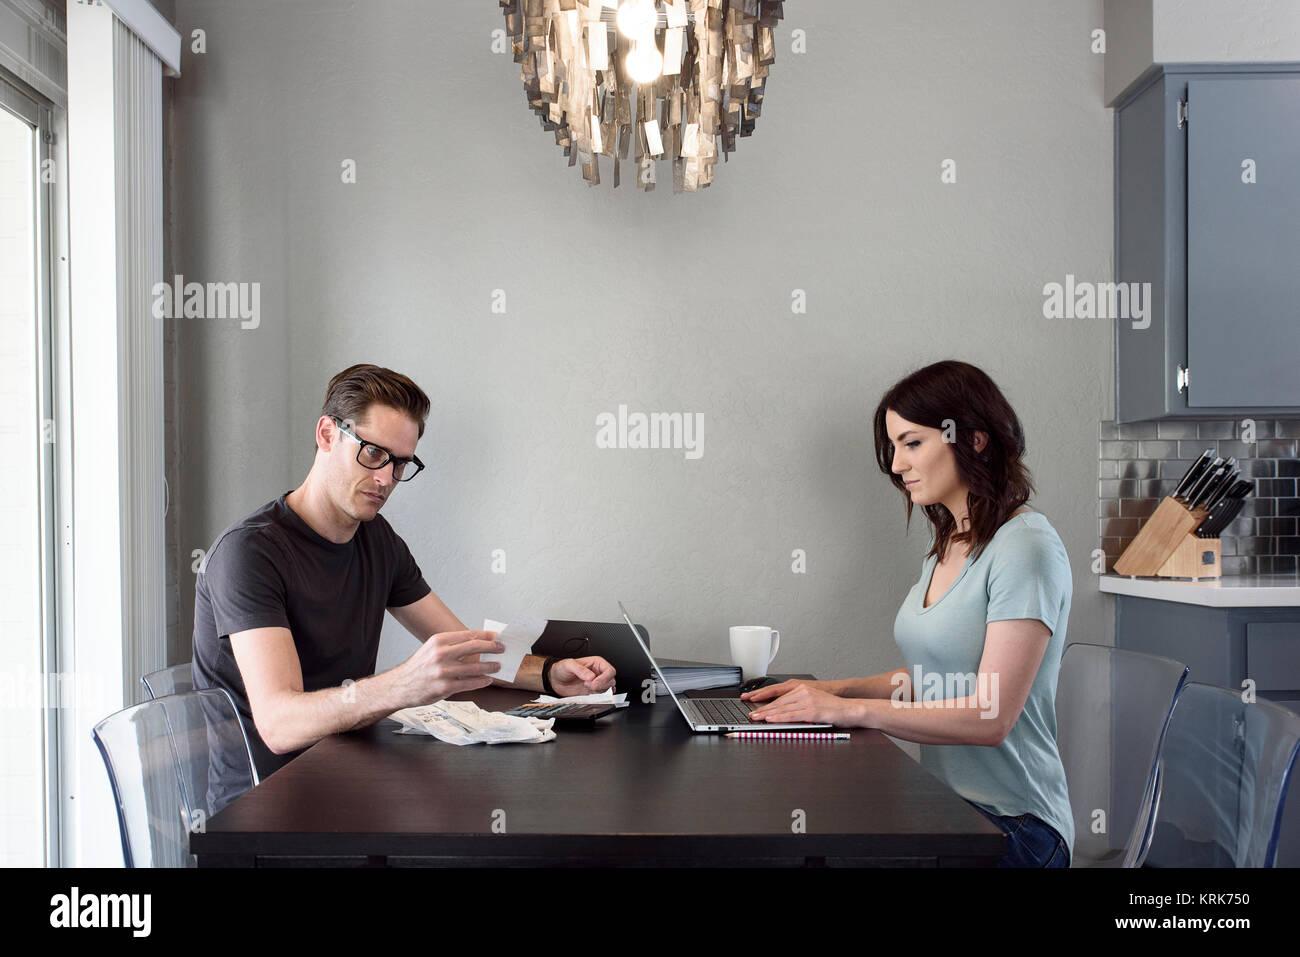 Caucasian man reading receipt while woman uses laptop - Stock Image